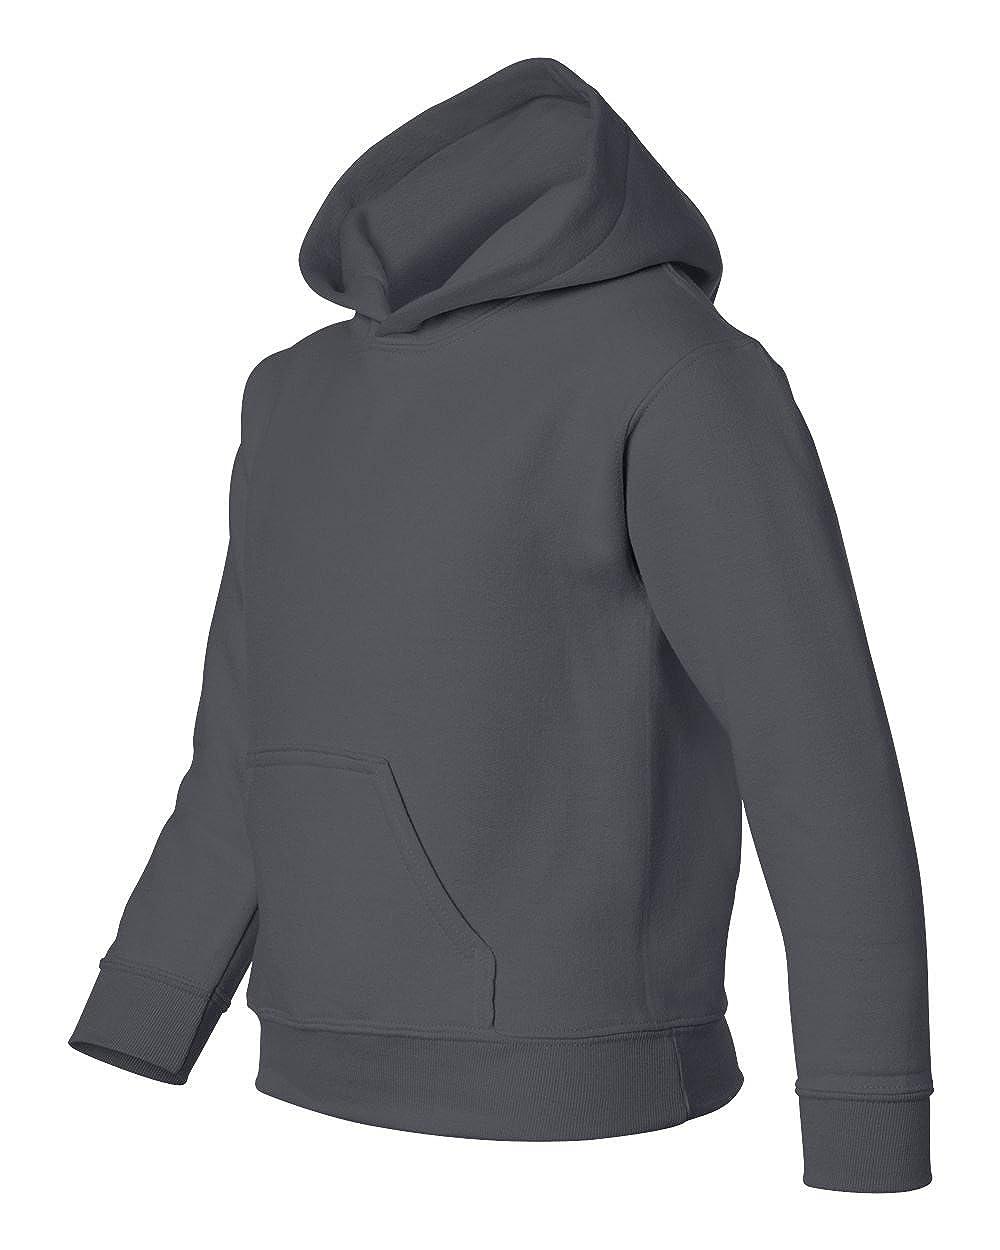 Gildan 18500B Heavy Blend Youth Hooded Sweatshirt